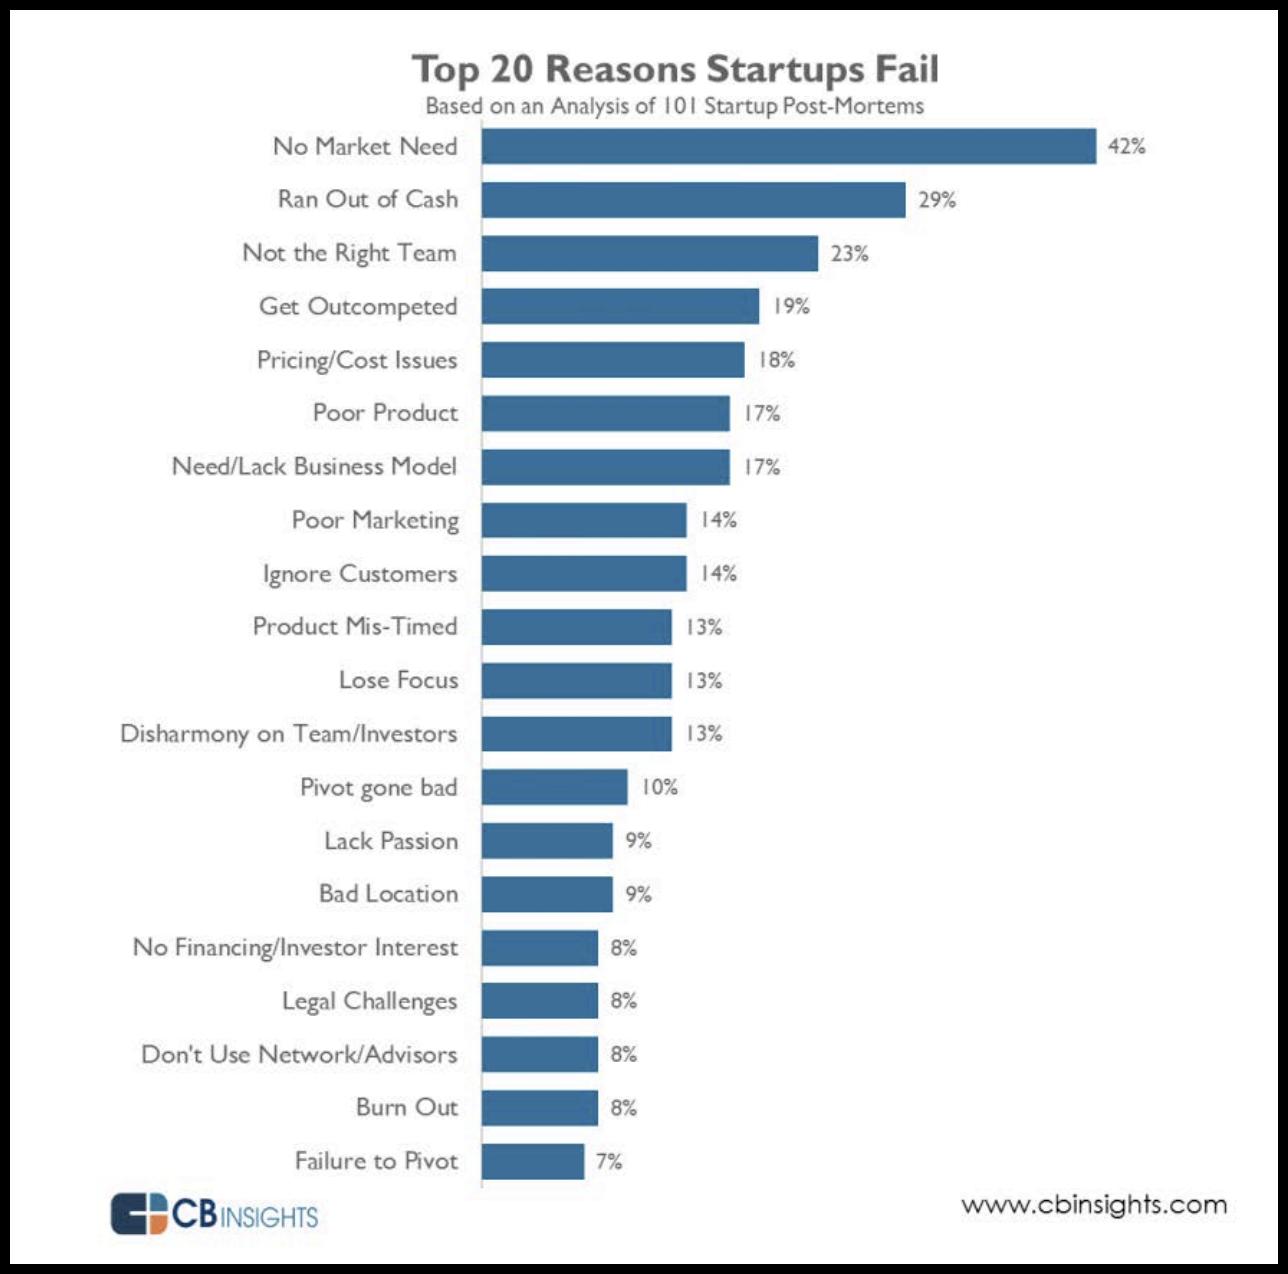 The-20-Reasons-Startups-Fail.pdf 2018-04-12 22-40-42